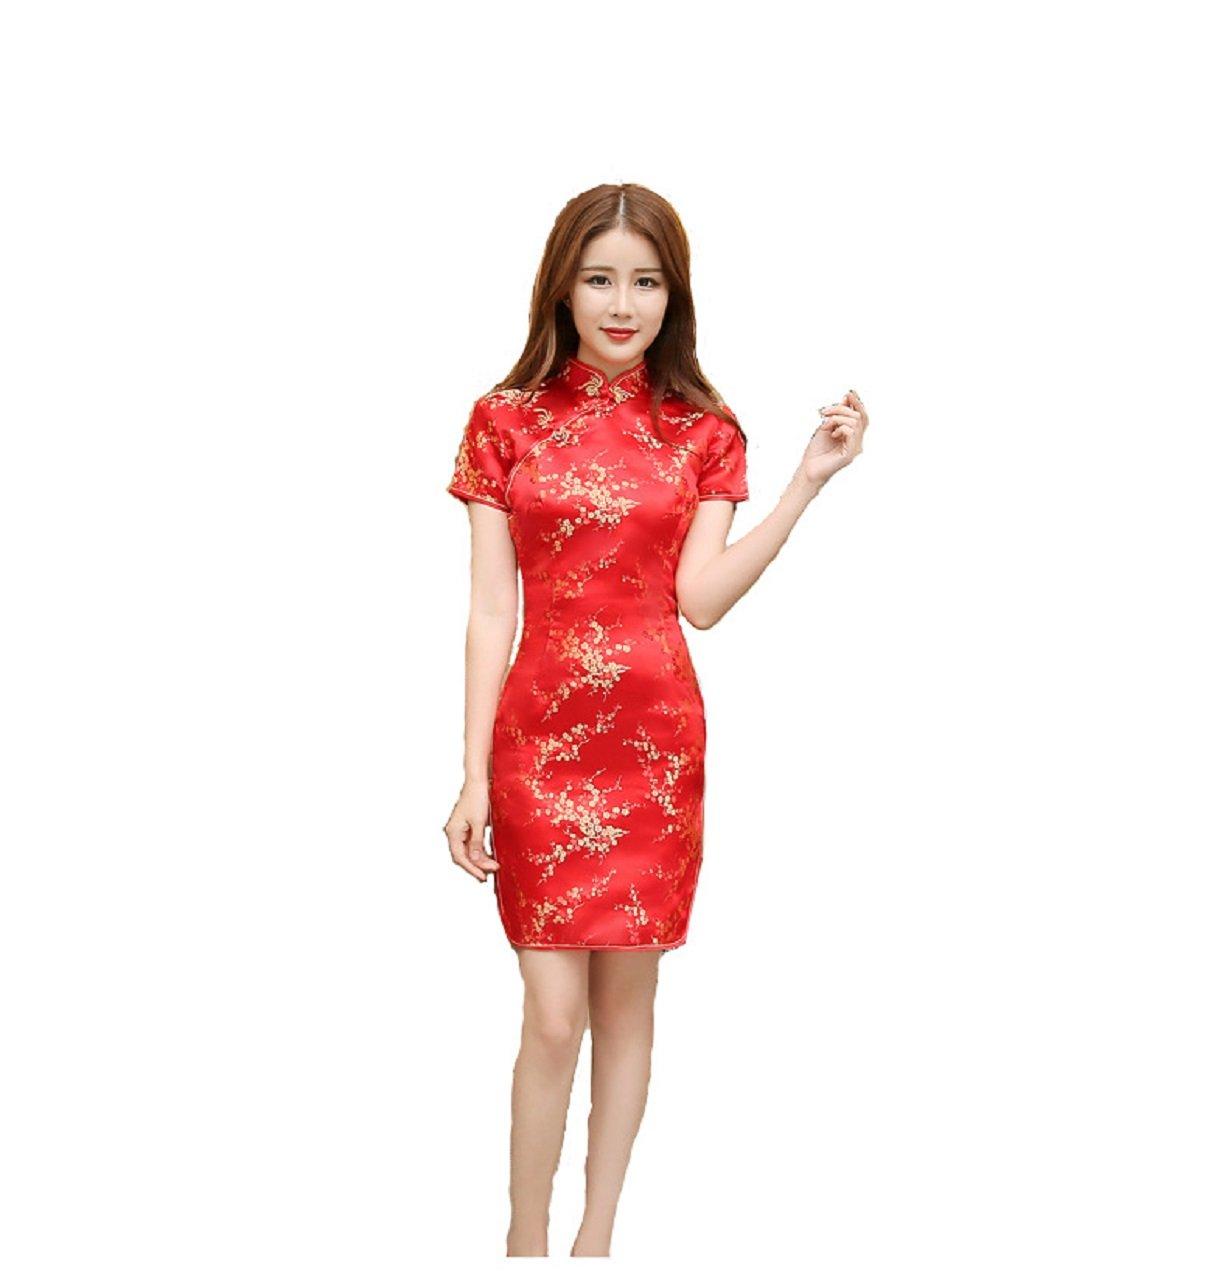 Kurop Women's Sexy Red Floral Mini Chinese Evening Dress Wedding Dress Cheongsam Qipao Flower Printing (M (US 2-4), Red Floral Mini)